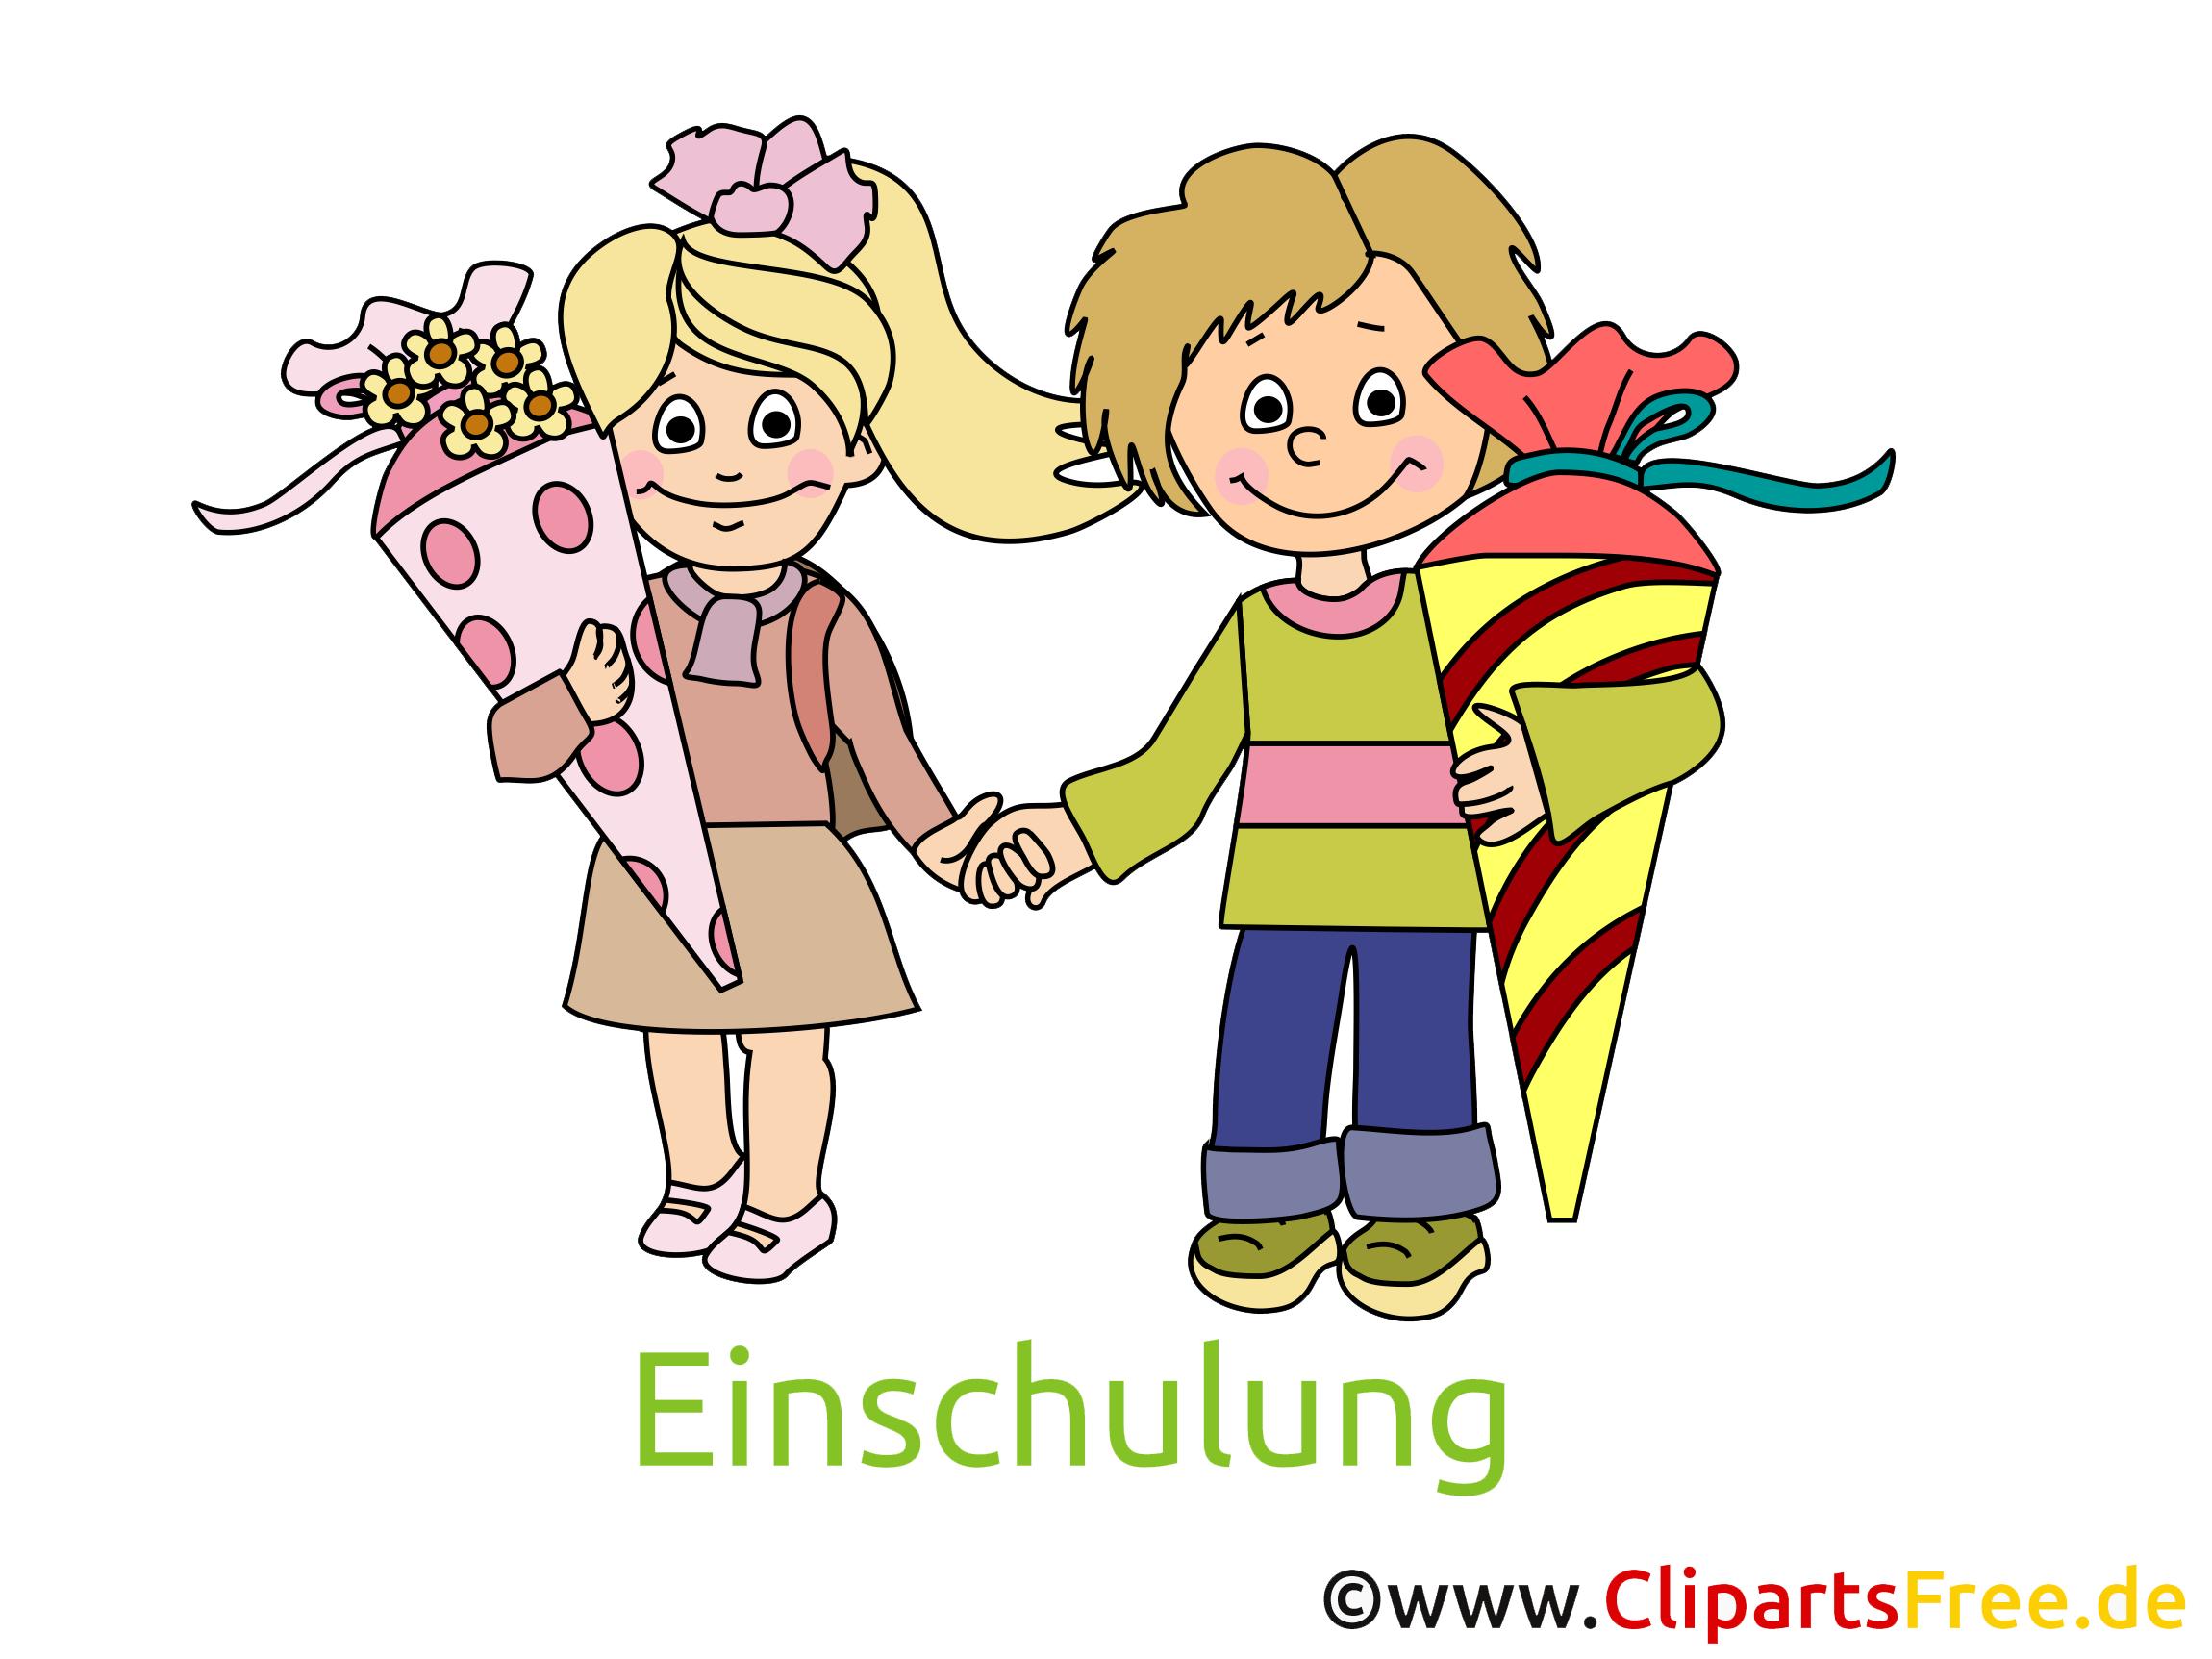 Schulanfang clipart kostenlos image royalty free Einschulung Bilder, Cliparts, Cartoons, Grafiken, Illustrationen ... image royalty free